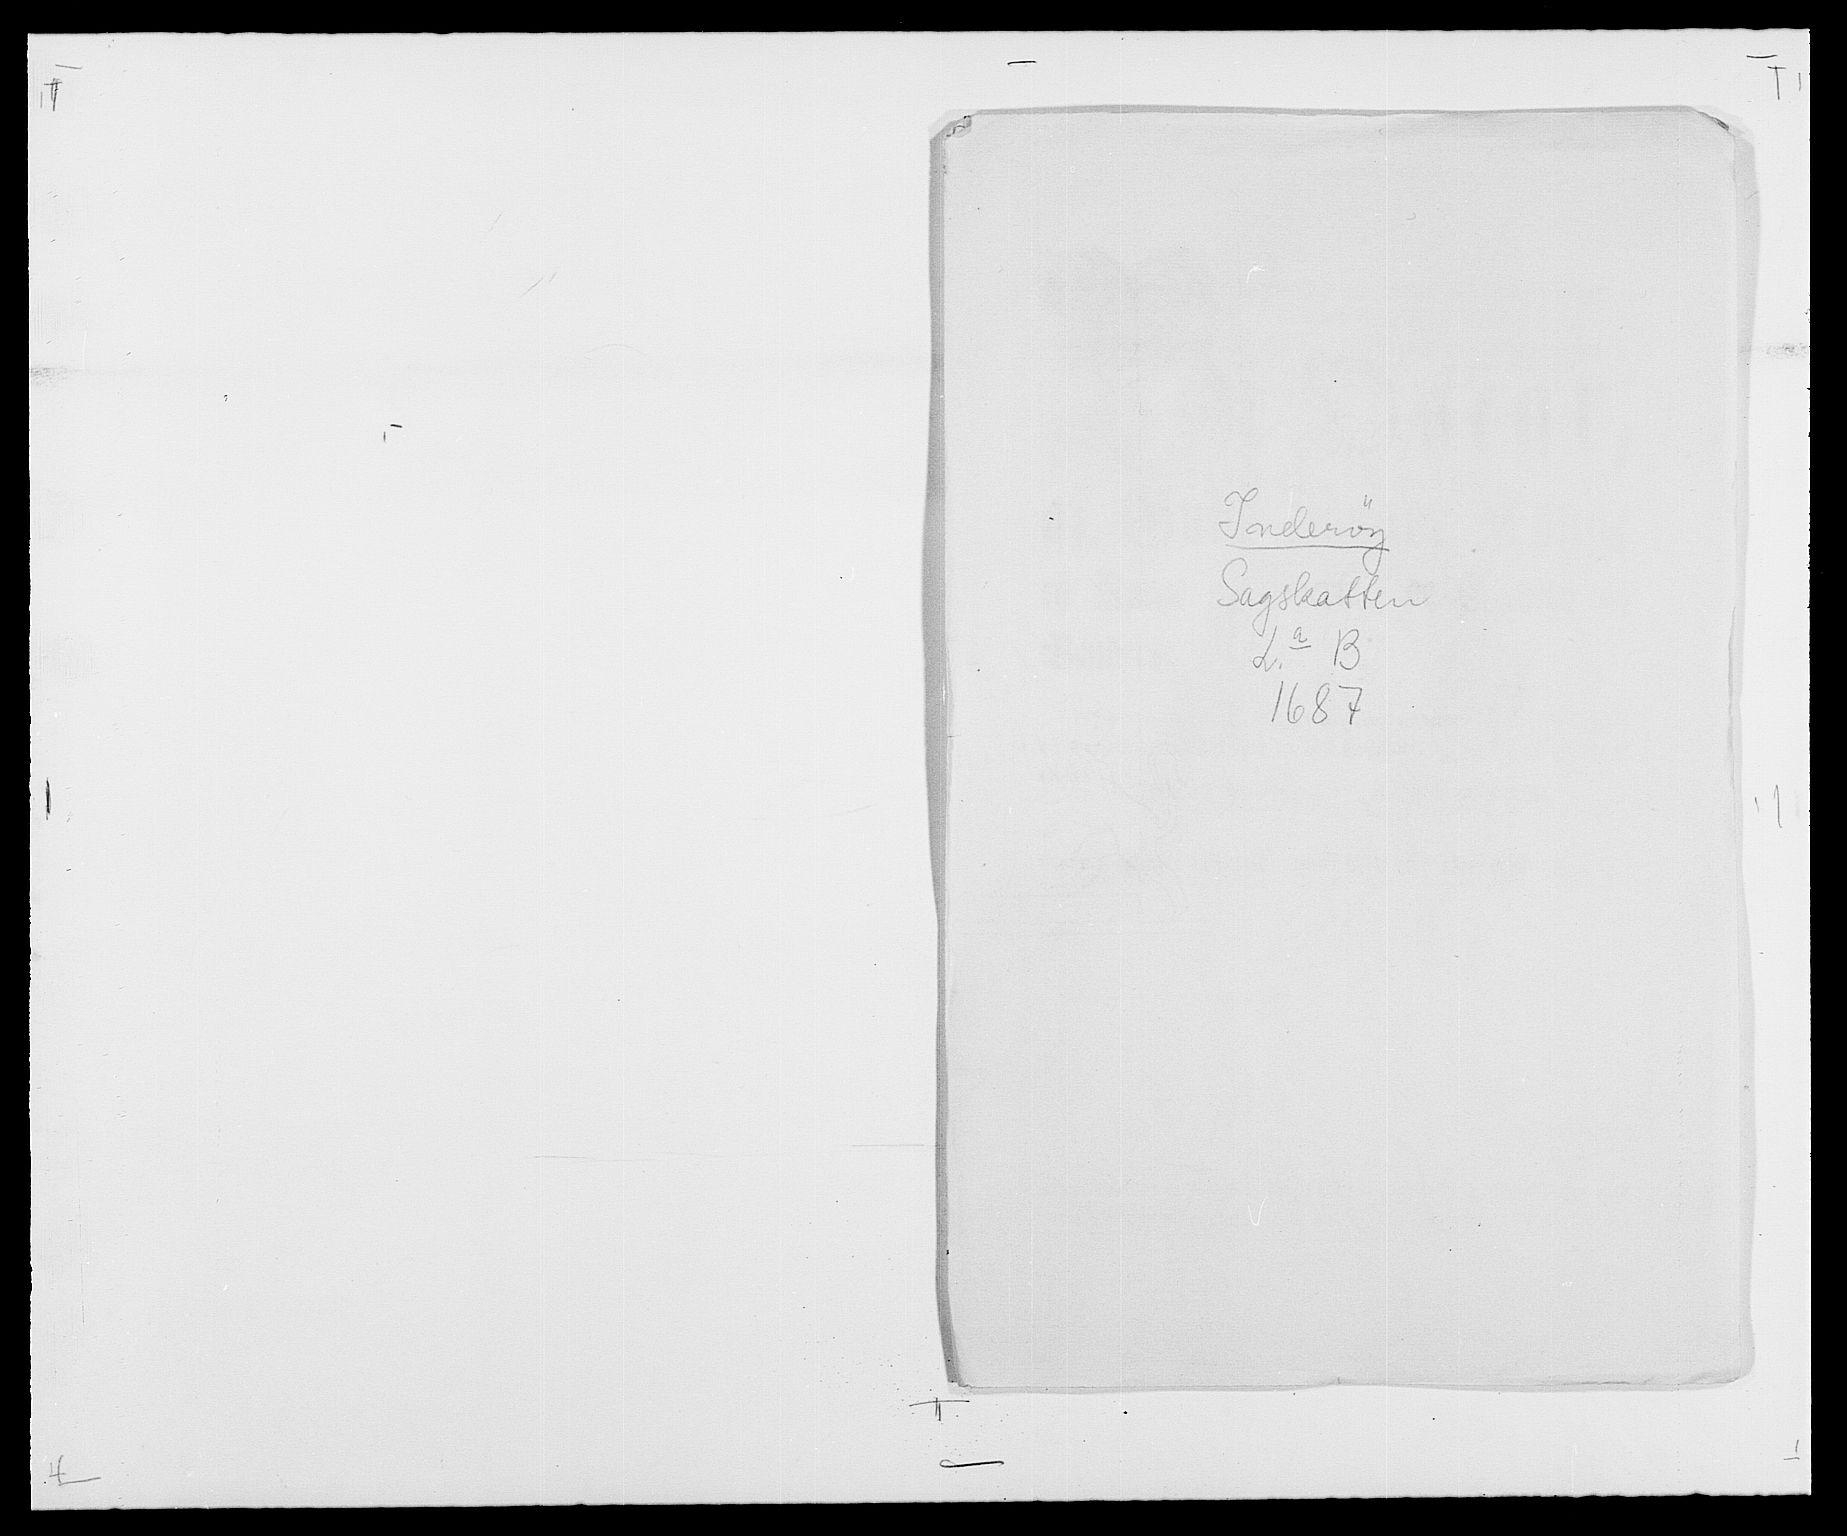 RA, Rentekammeret inntil 1814, Reviderte regnskaper, Fogderegnskap, R63/L4306: Fogderegnskap Inderøy, 1687-1689, s. 76